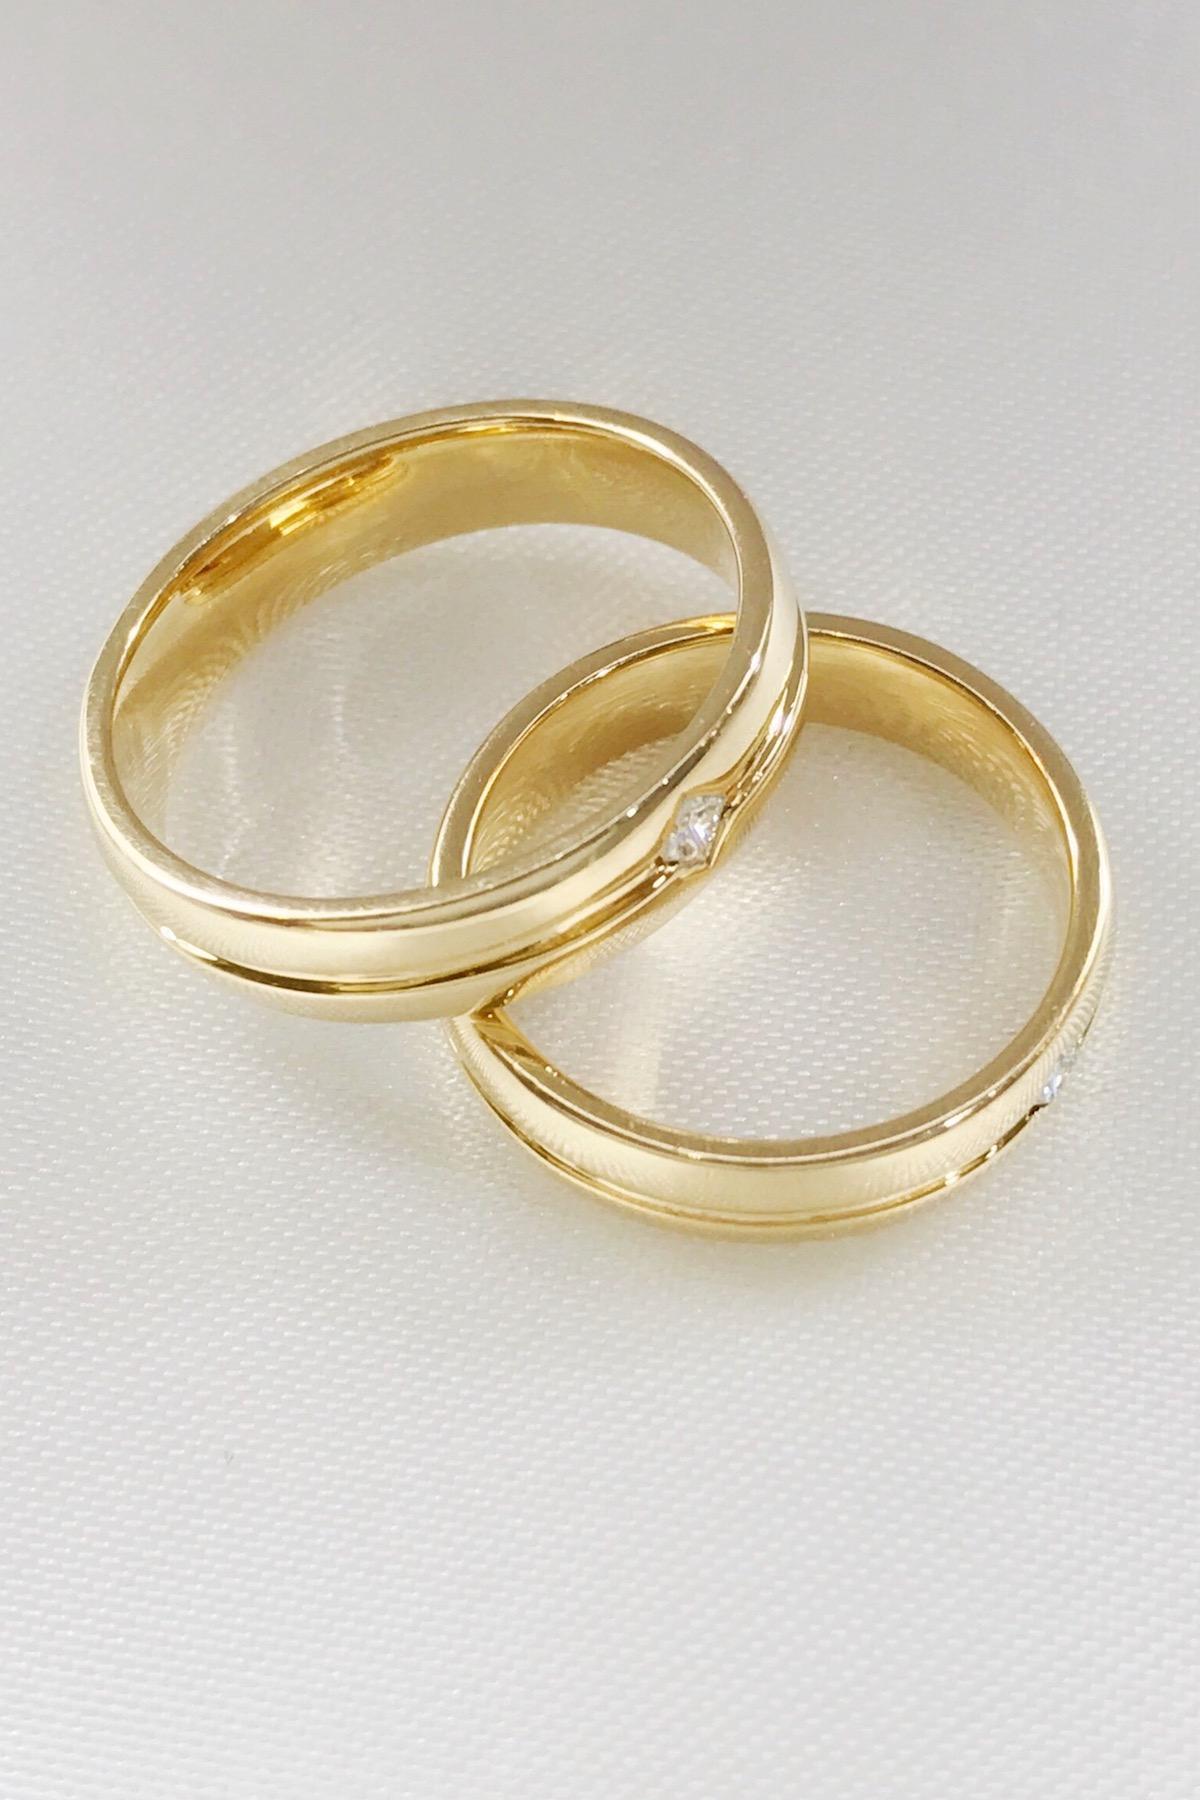 14k Yellow Gold Wedding Ring